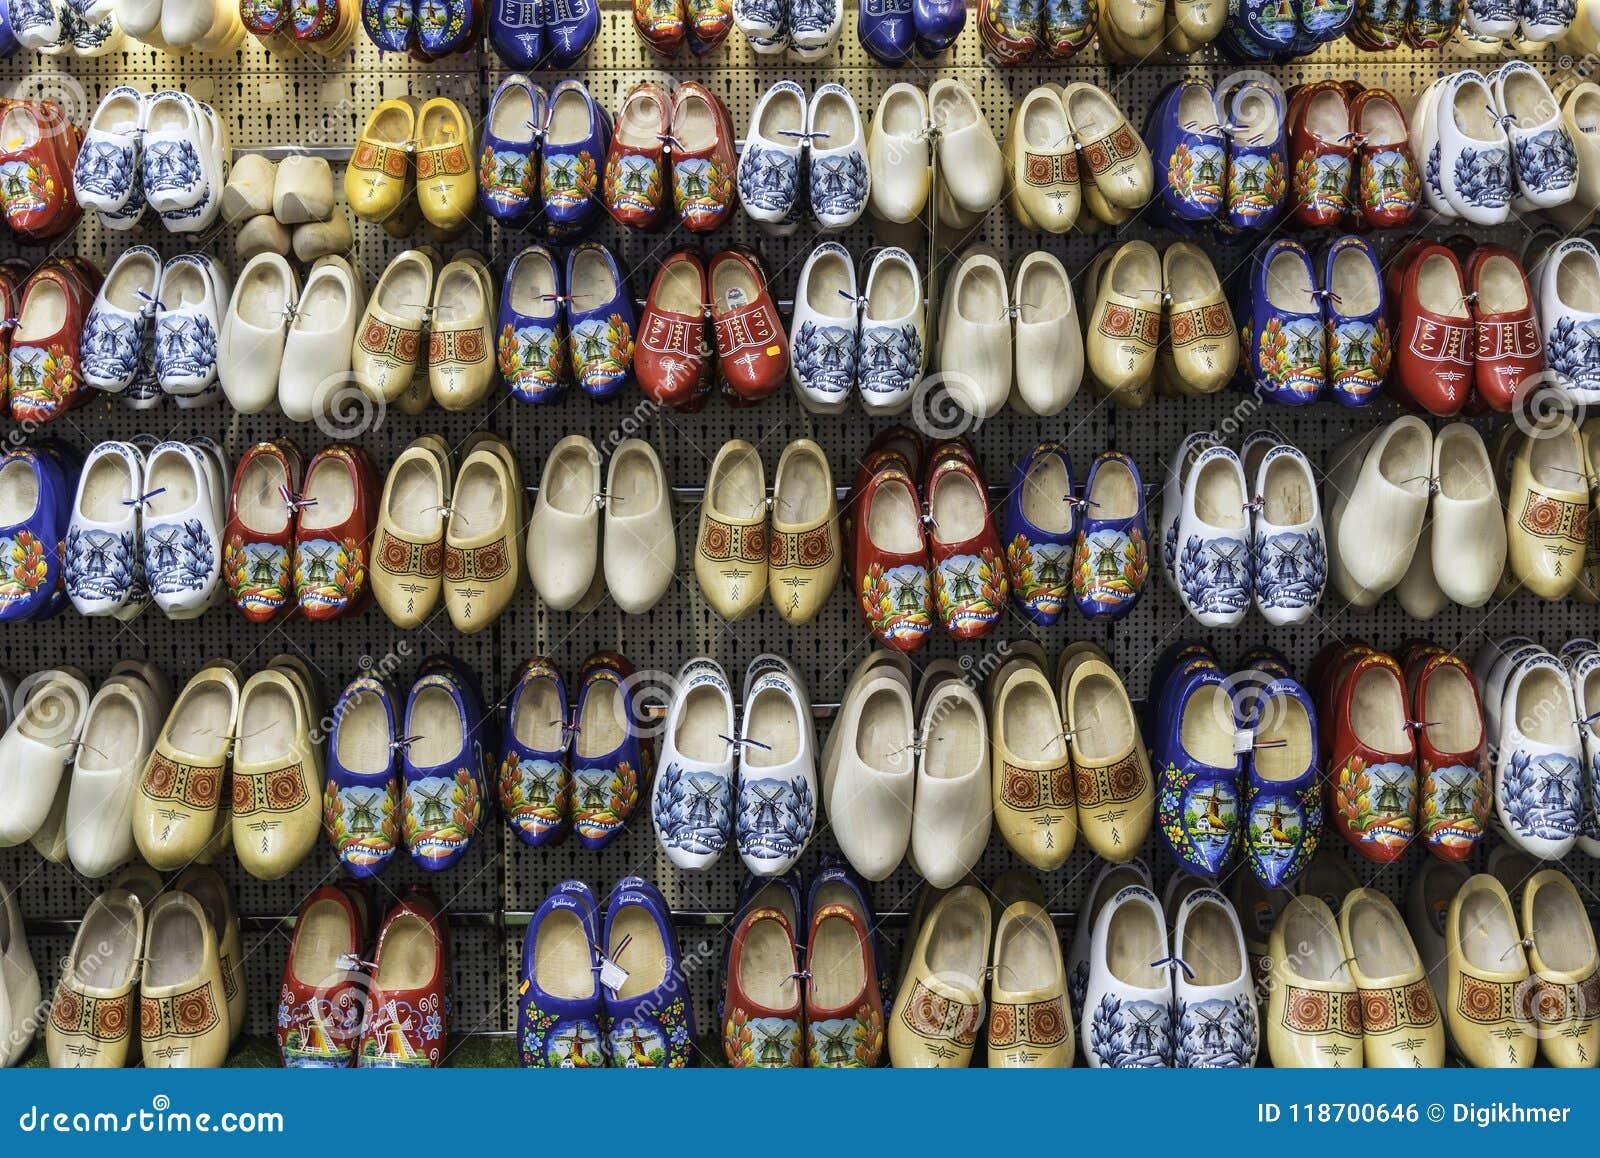 Dutch clogs on sale at Amsterdam shop